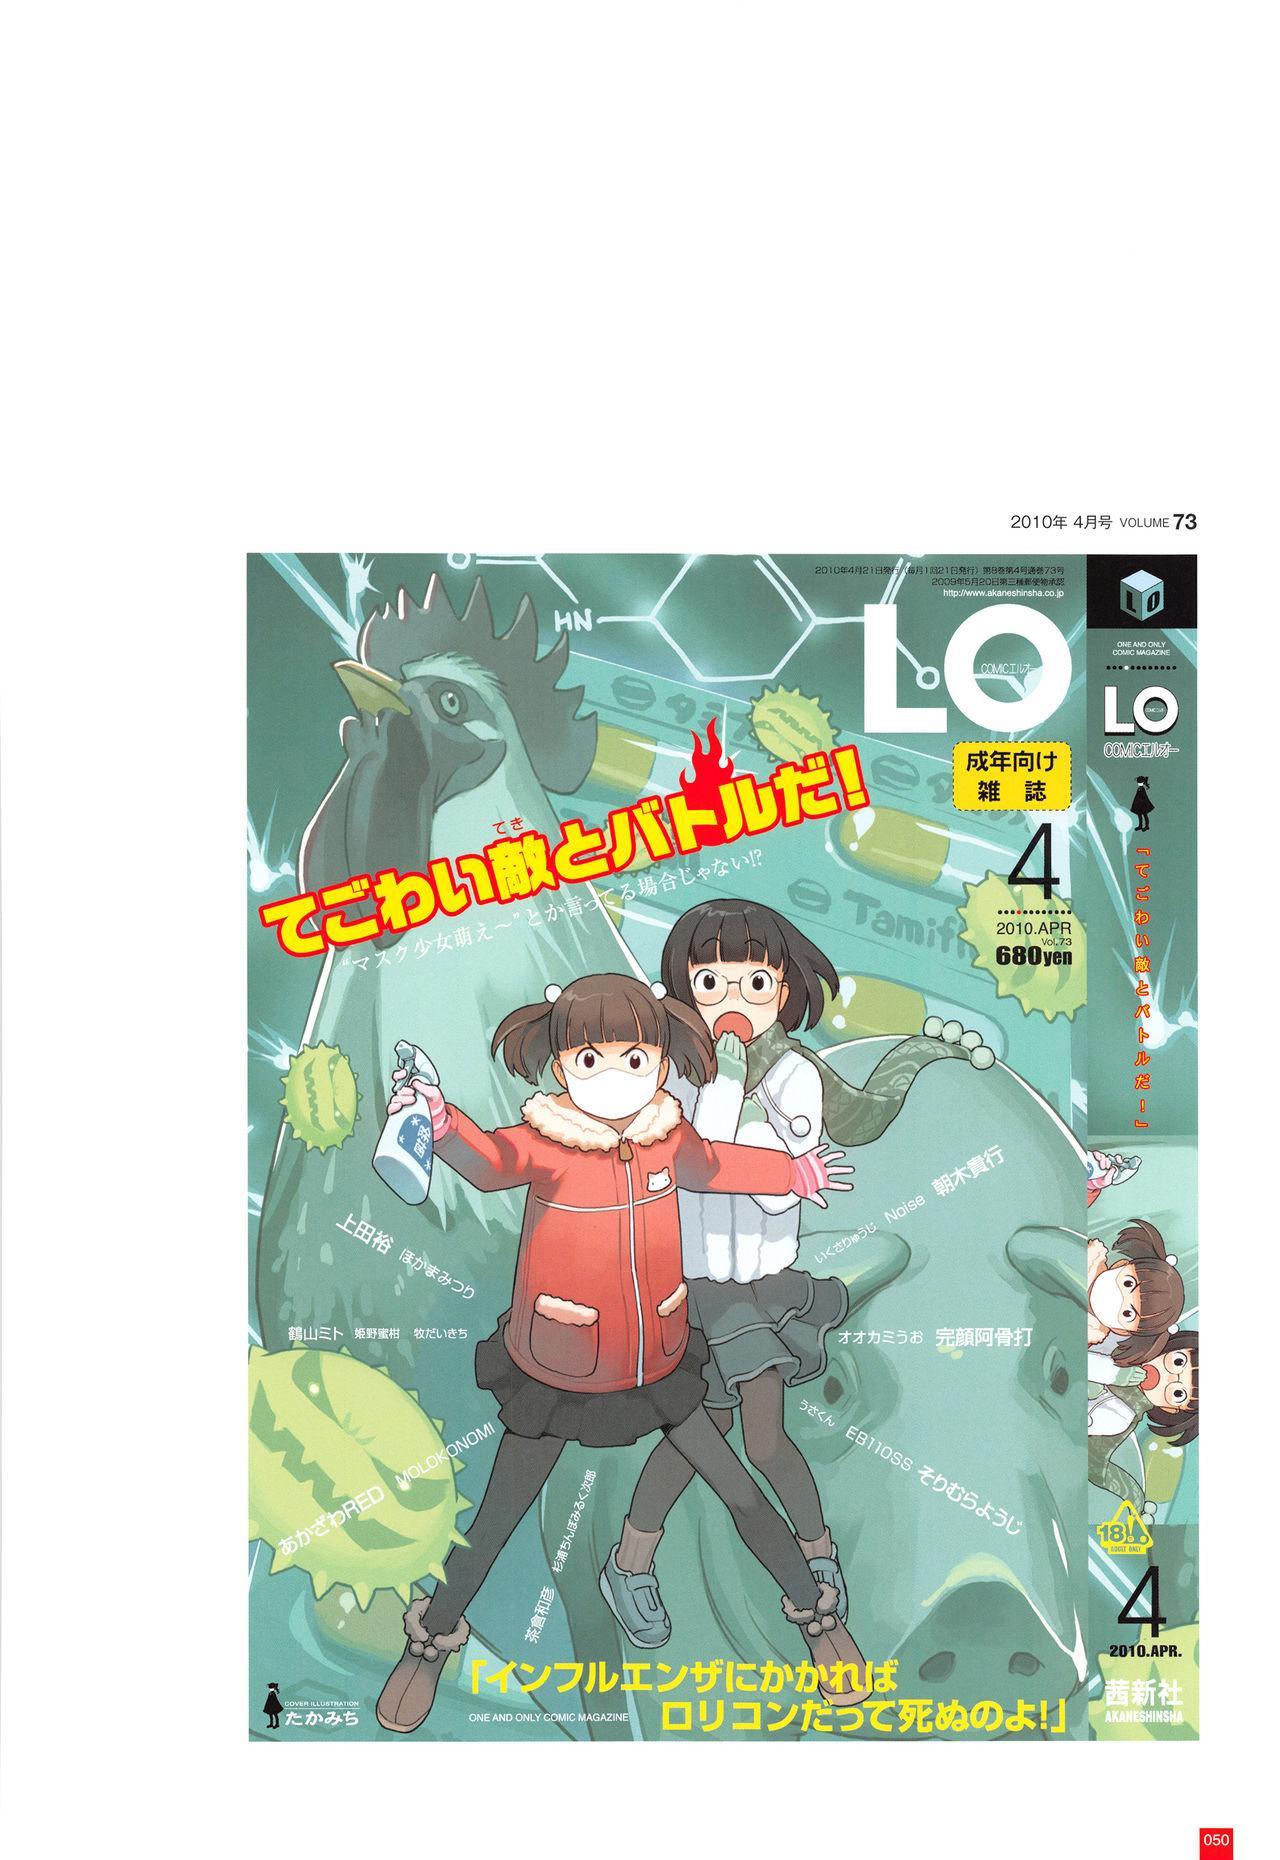 LO Artbook 2-A TAKAMICHI LOOP WORKS 52